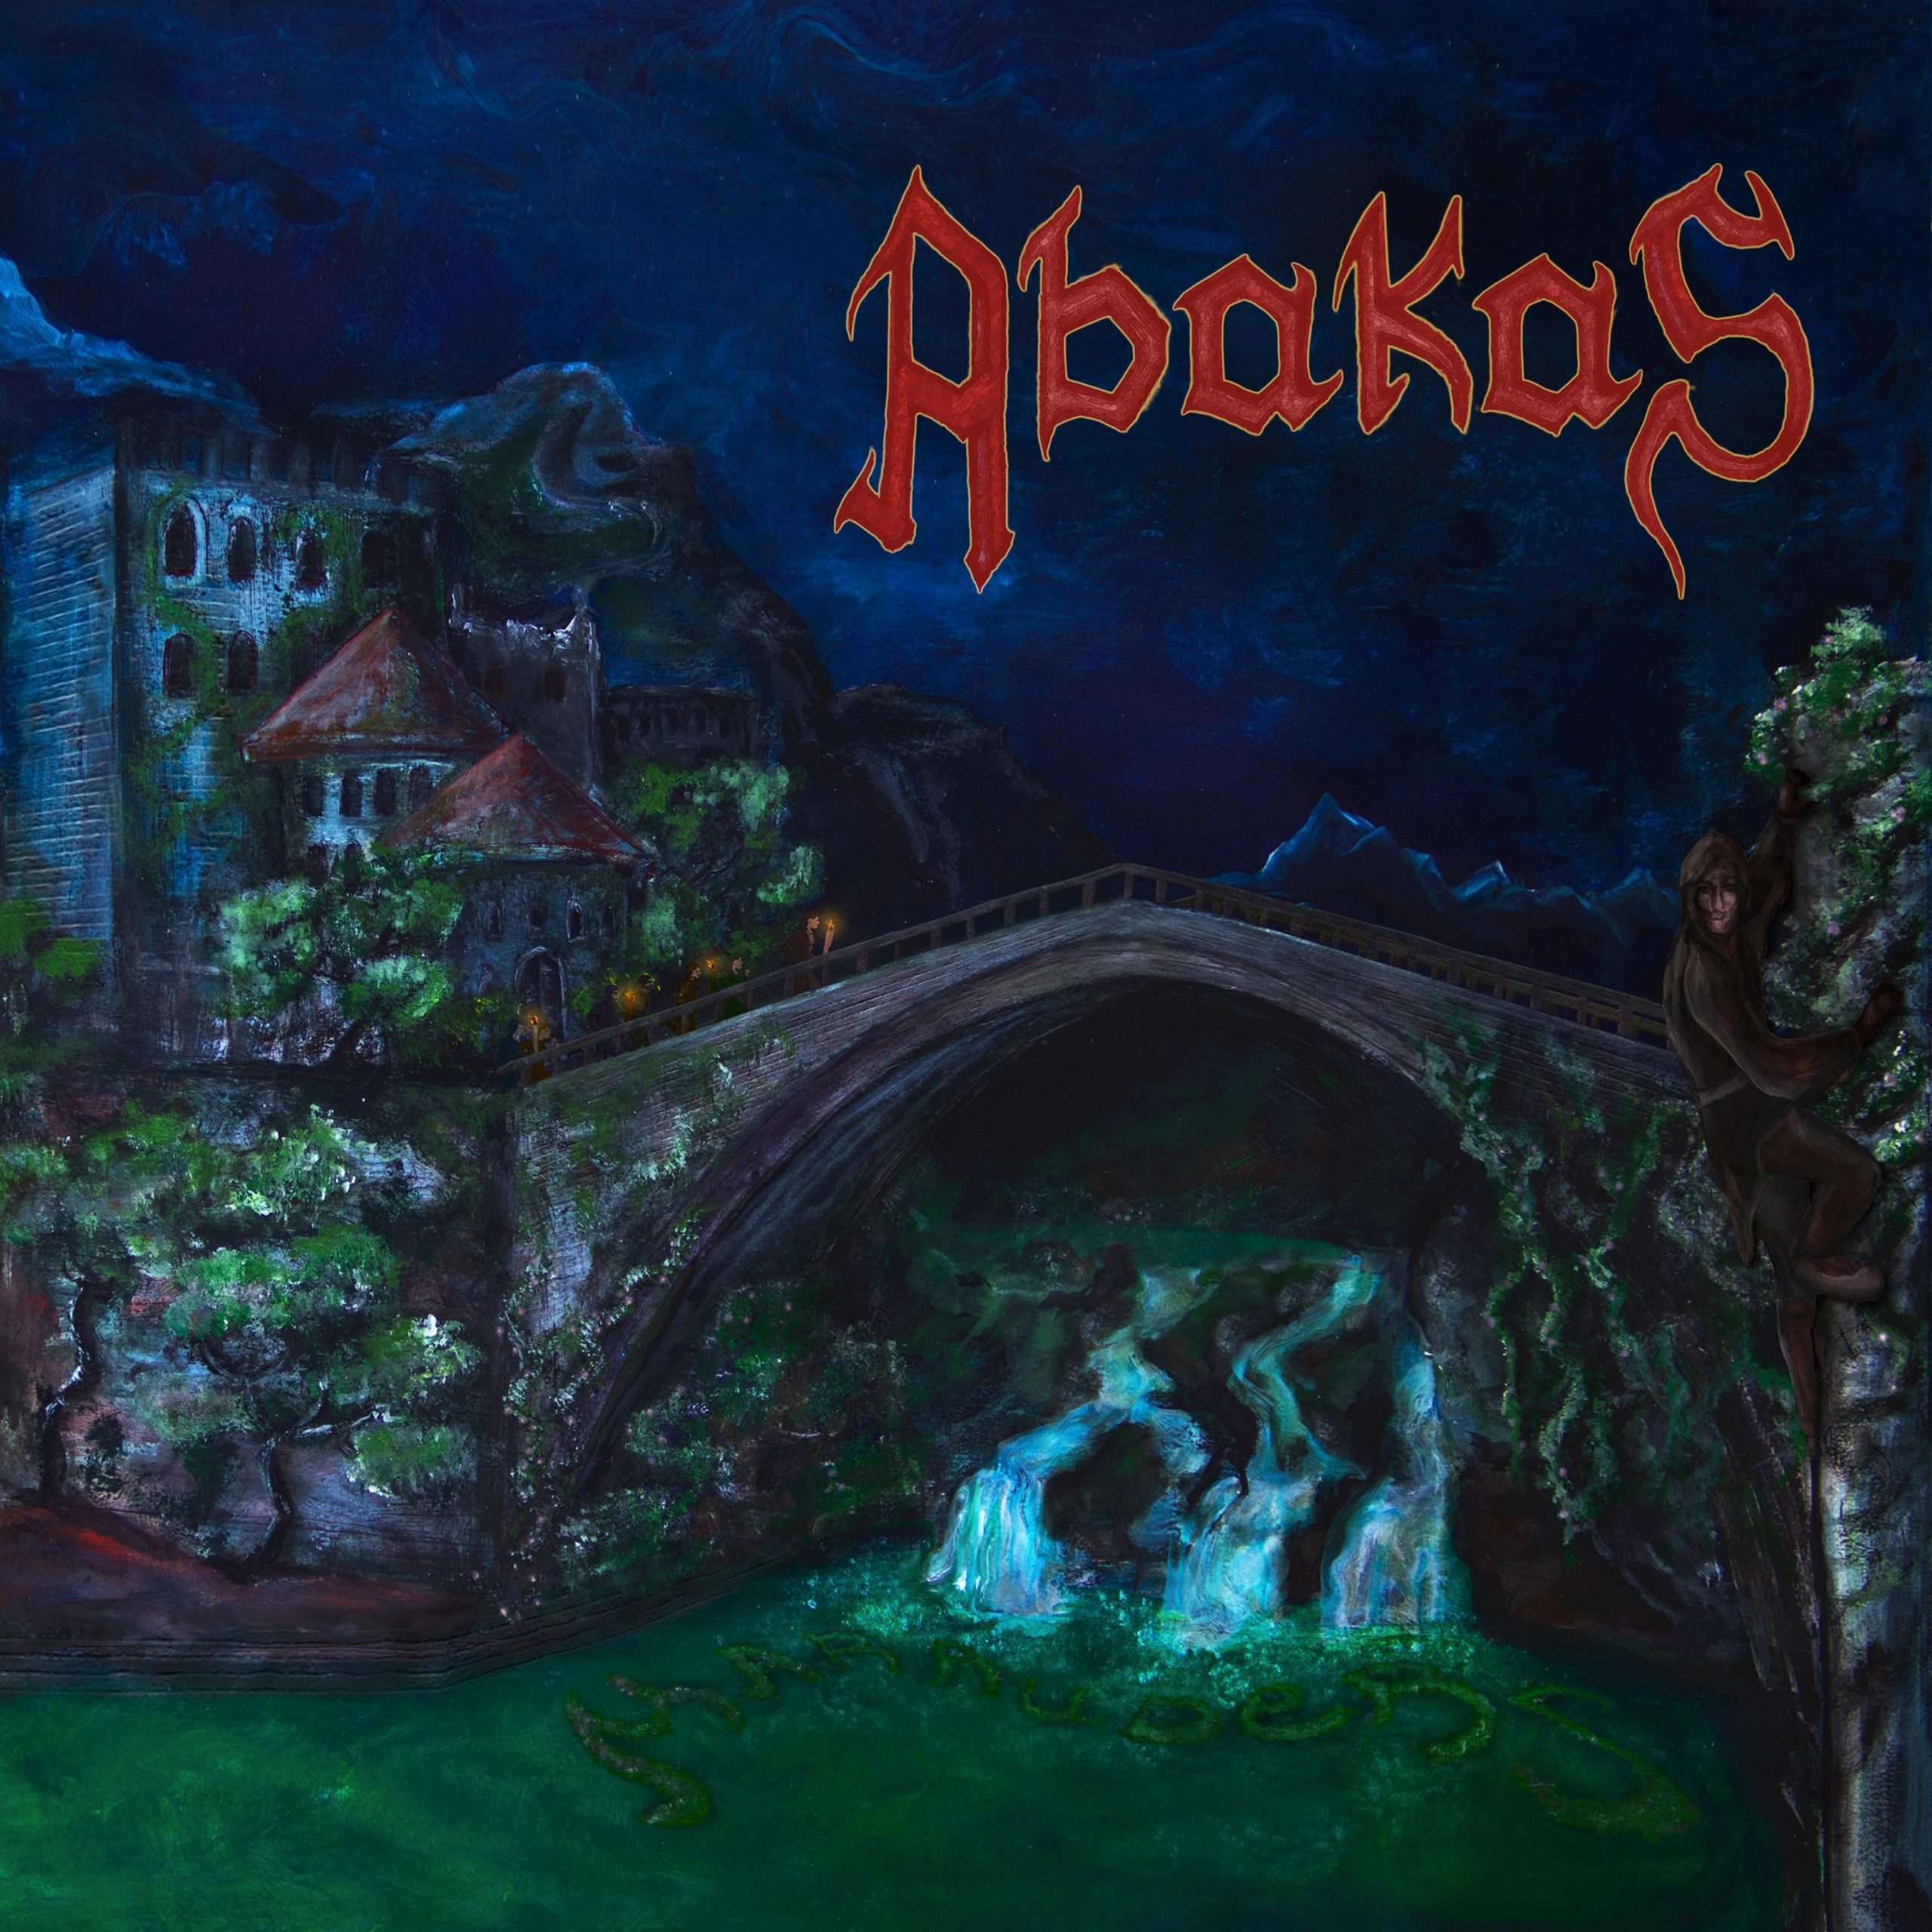 Abakas // Marauder - EP cover